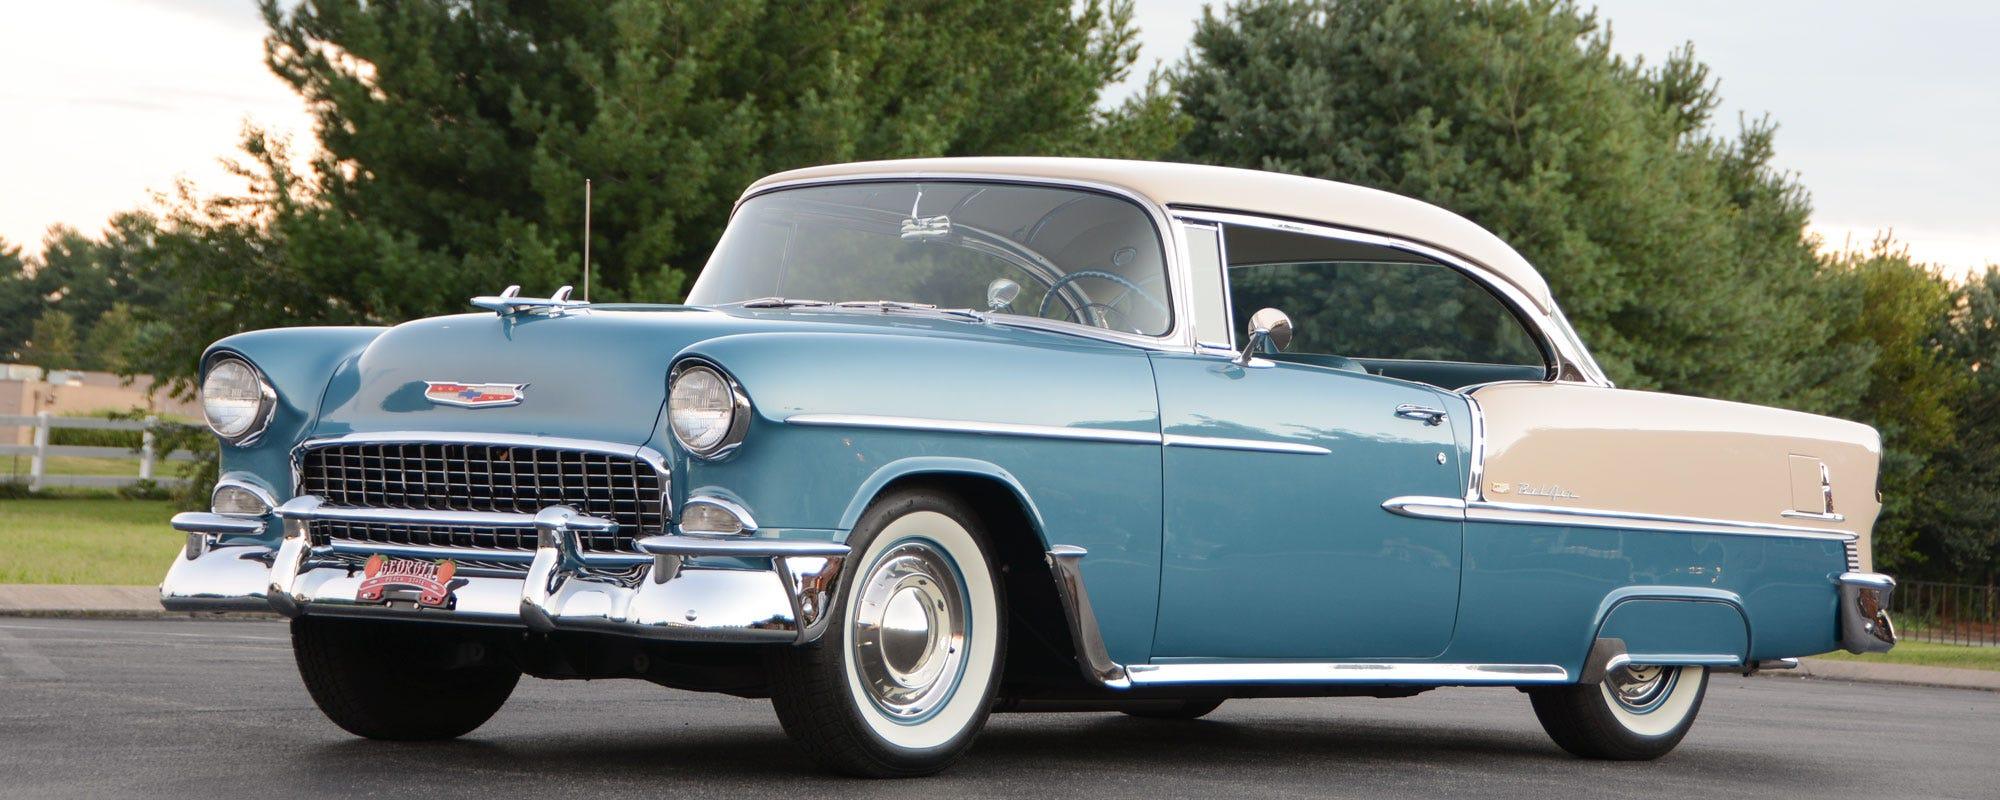 1955 Chevrolet Bel Air 2 Door Hard top with Whitewall Tires